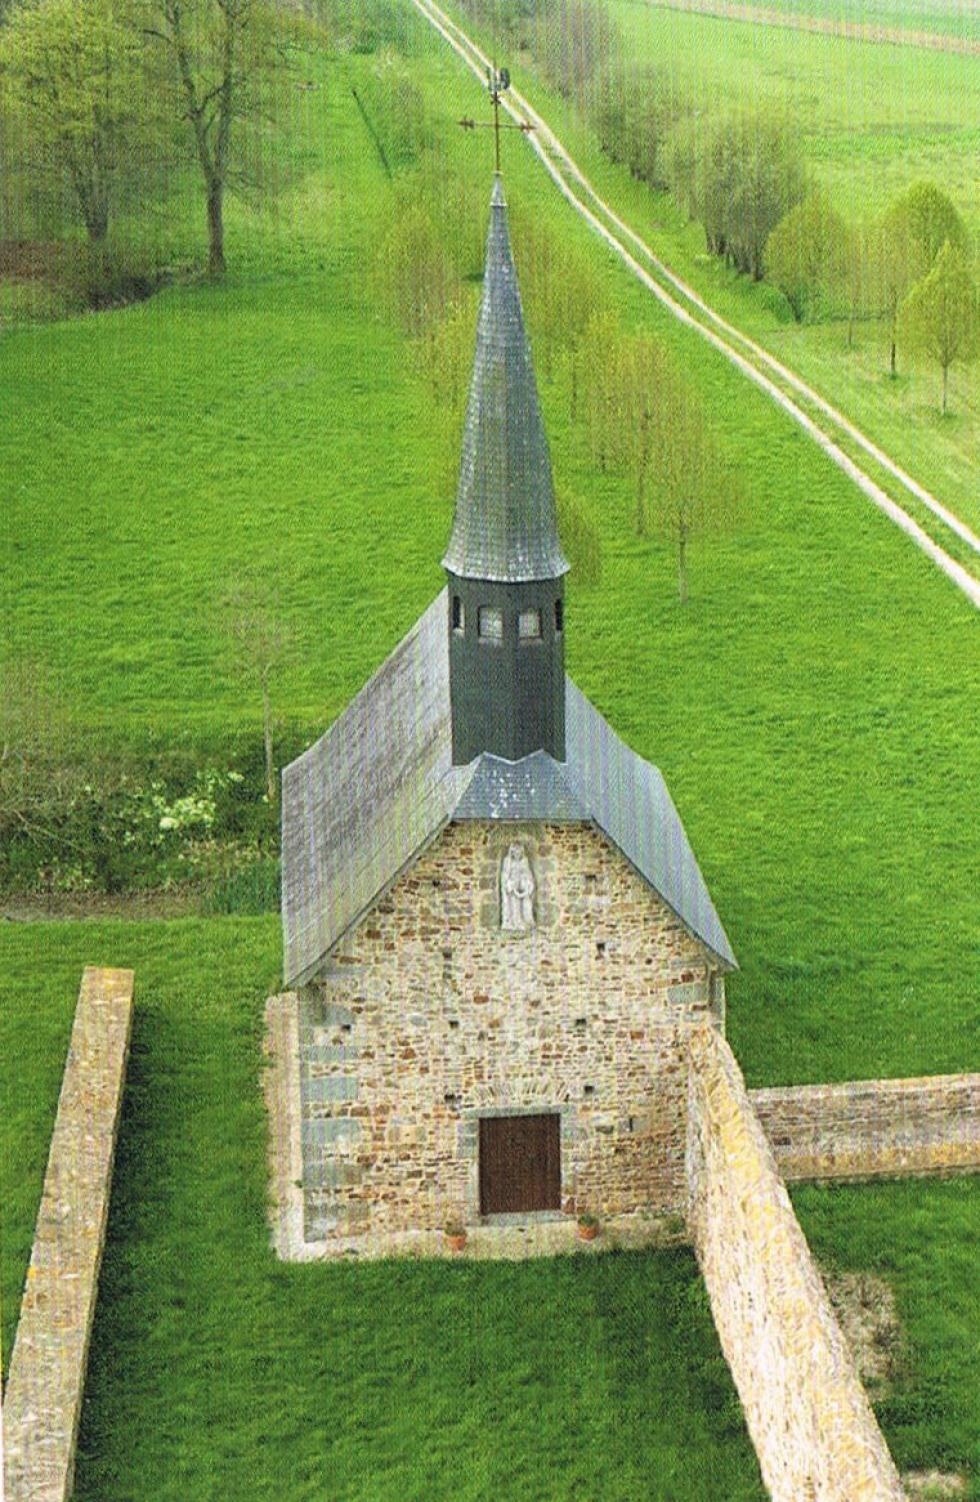 Mdy Pont L Eveque archives, histoire, documentation - la chaslerie